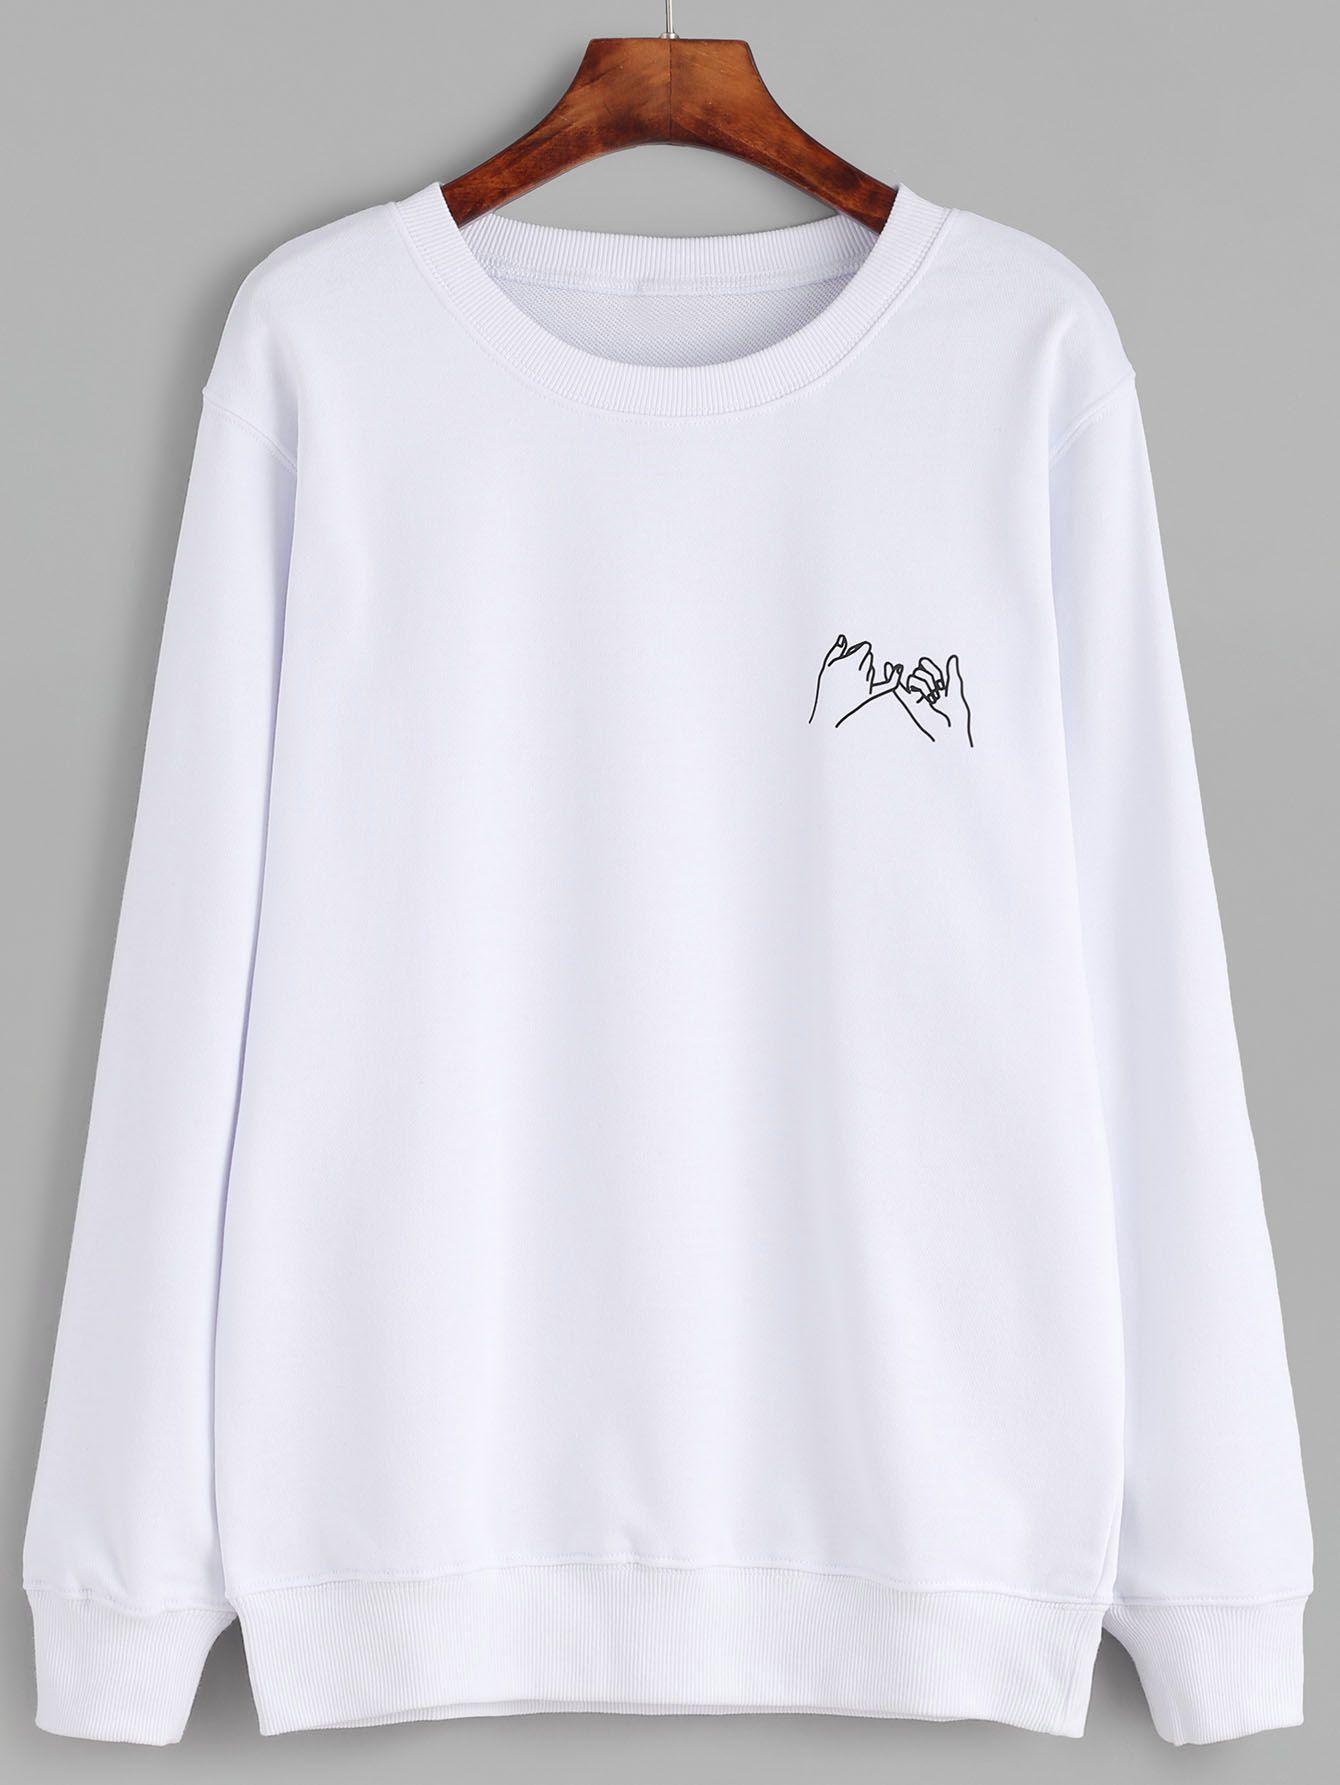 bd8c034b4fed White Gesture Print SweatshirtFor Women-romwe